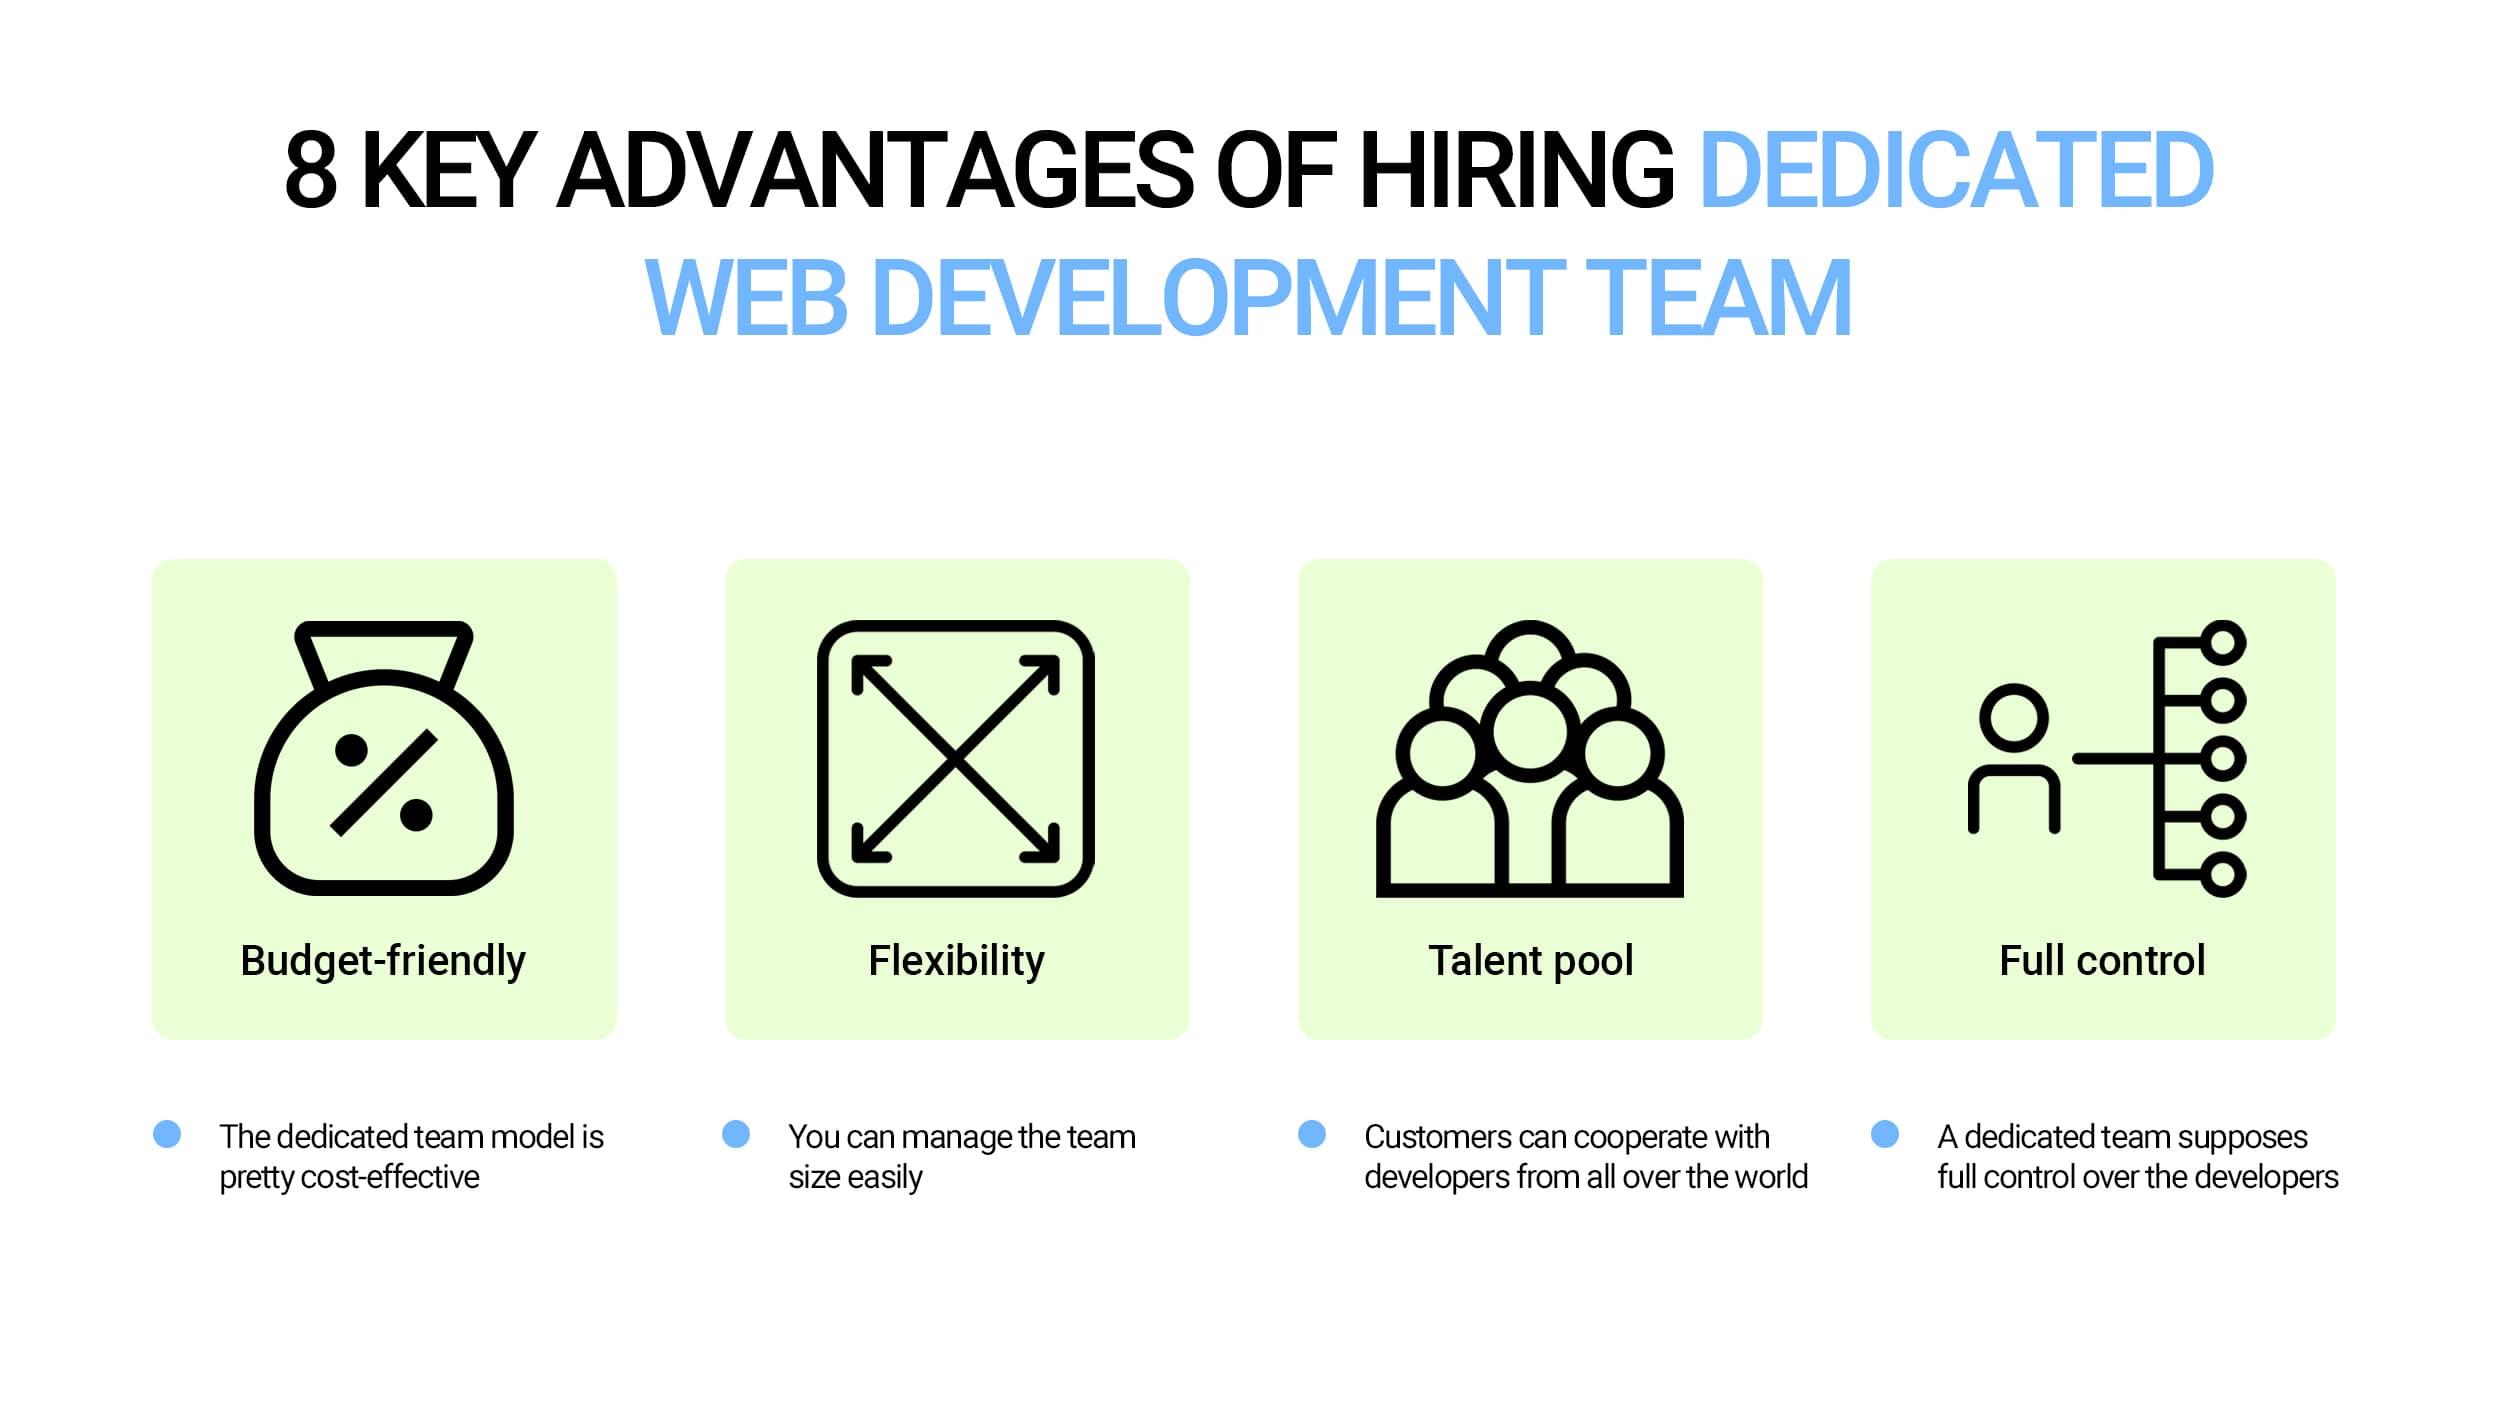 Advantages of Hiring Dedicated Web Development Team